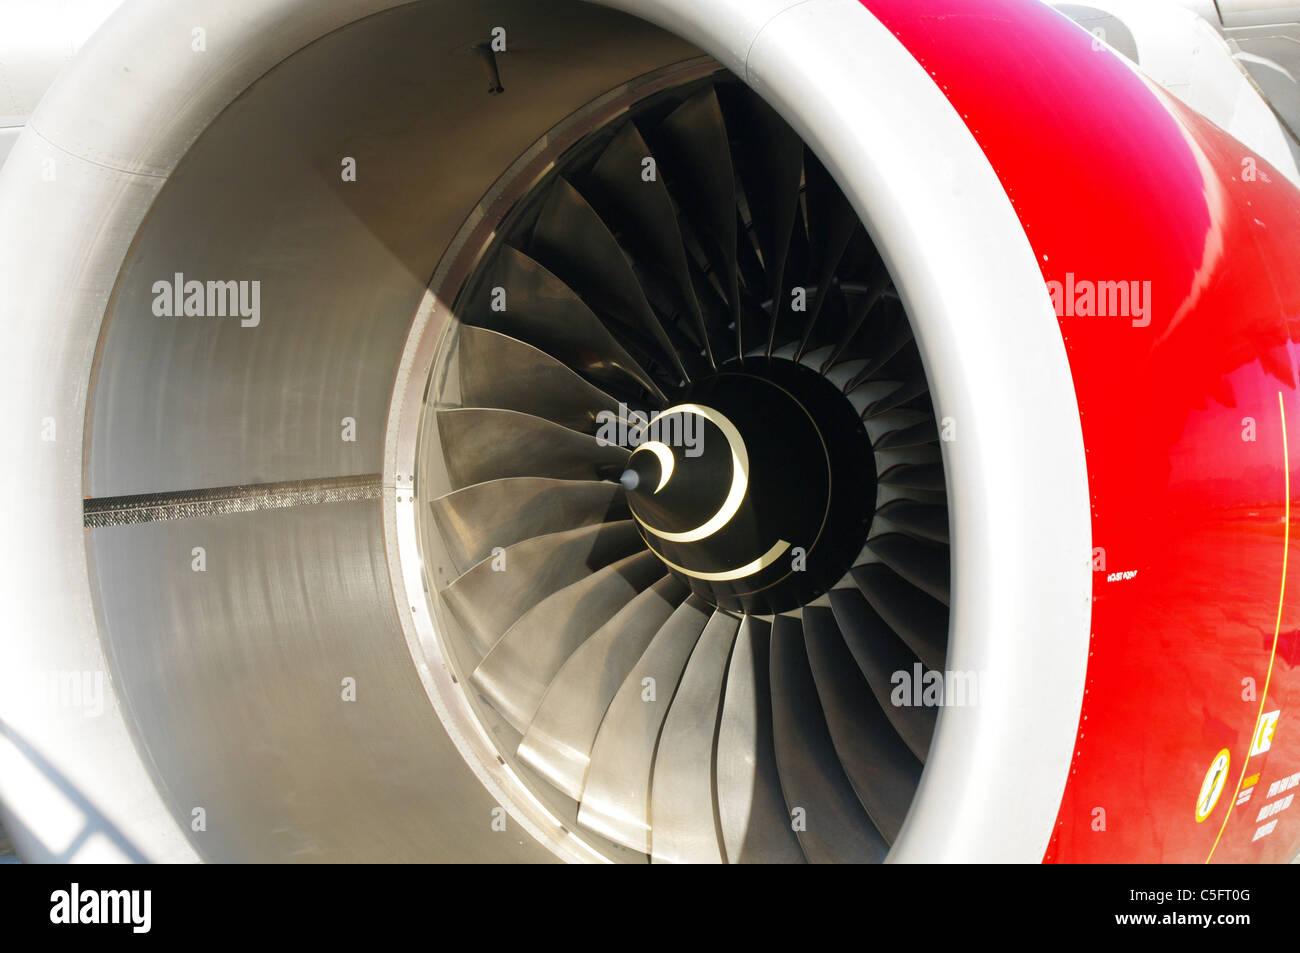 Jet engine inlet - Stock Image